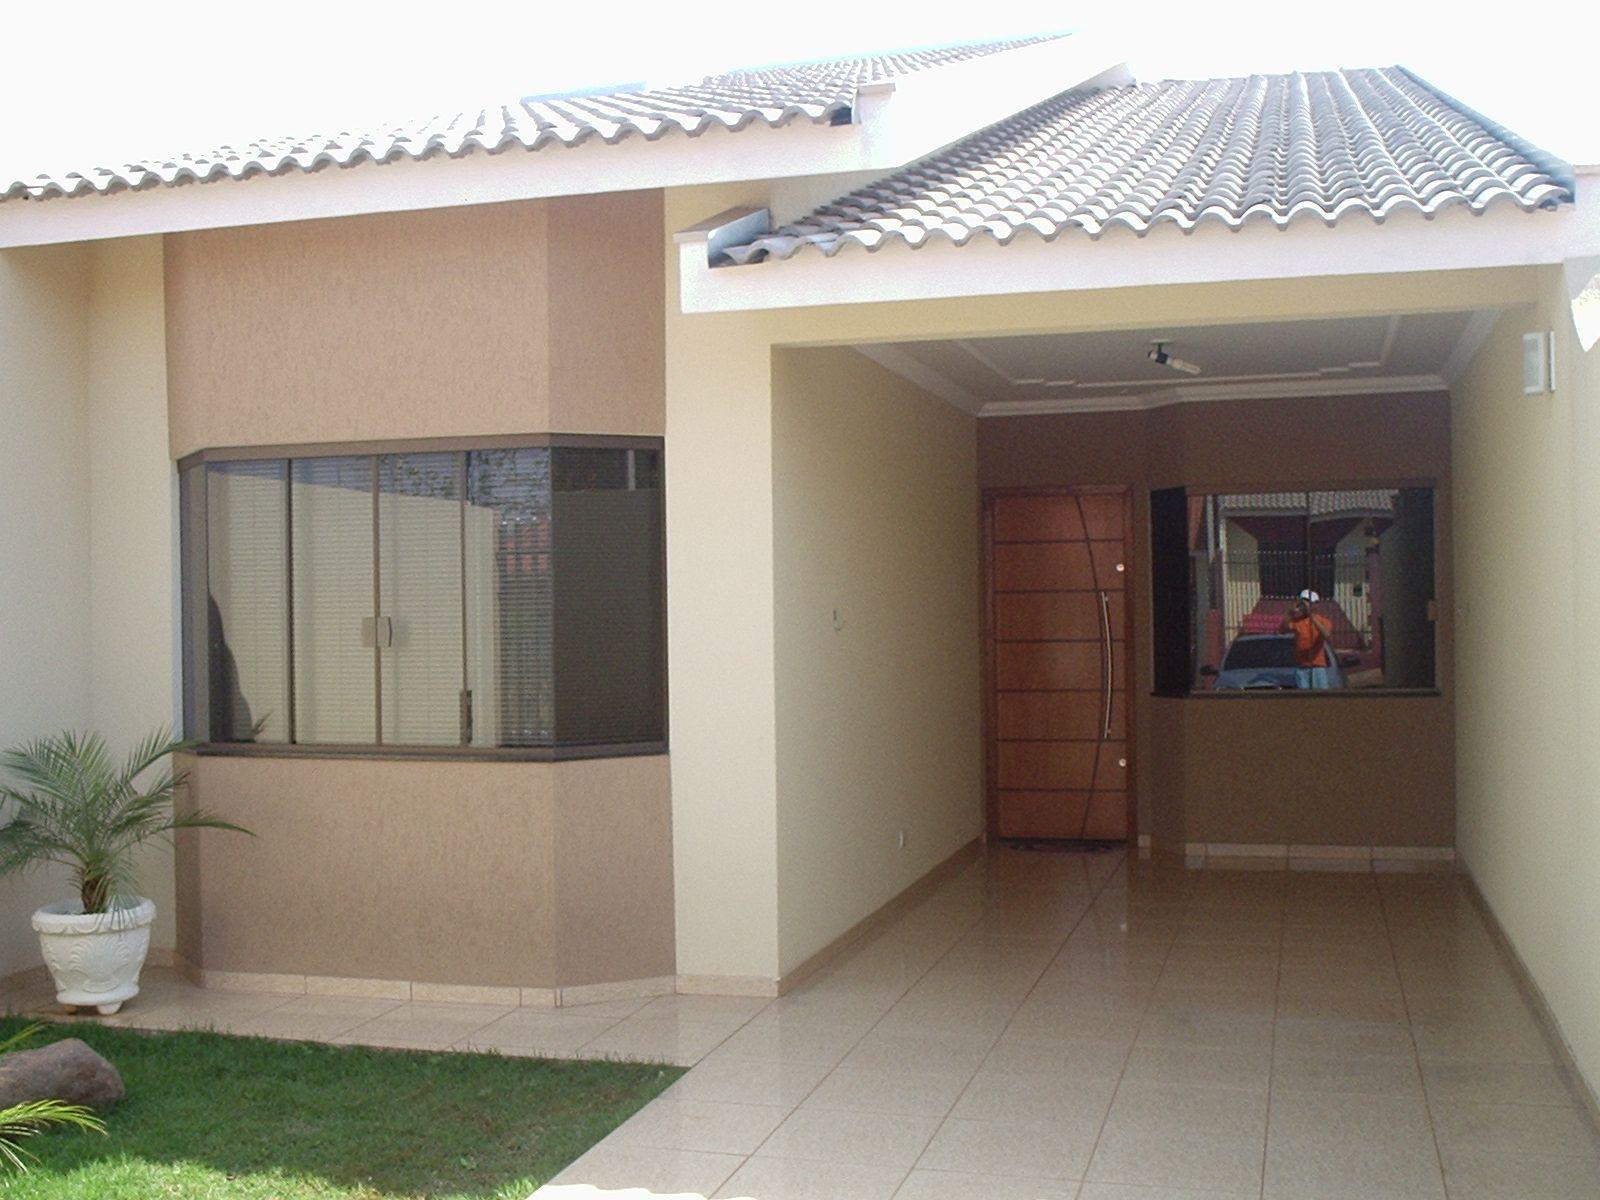 projetos de casas modernas e pequenas grtis